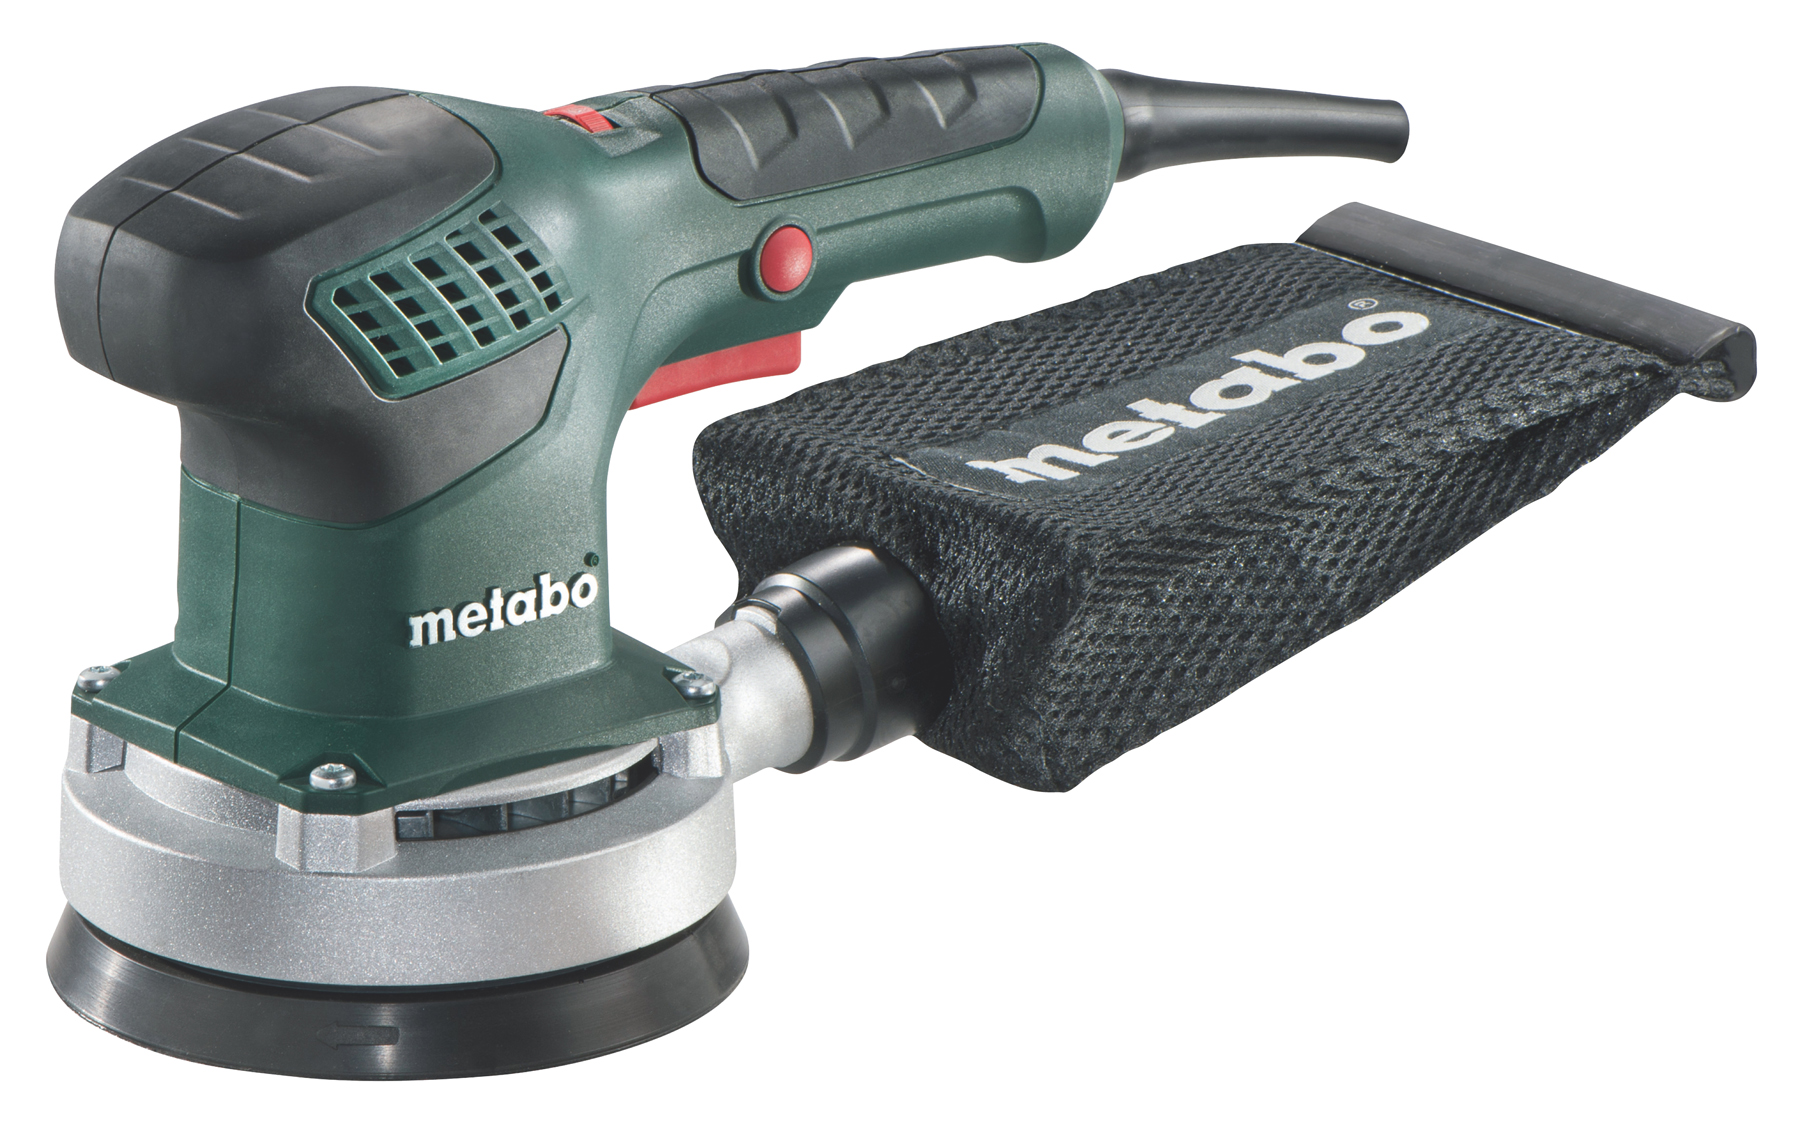 Metabo SXE 3125 (600443500) - эксцентриковая шлифмашина + кейс (Green) от iCover